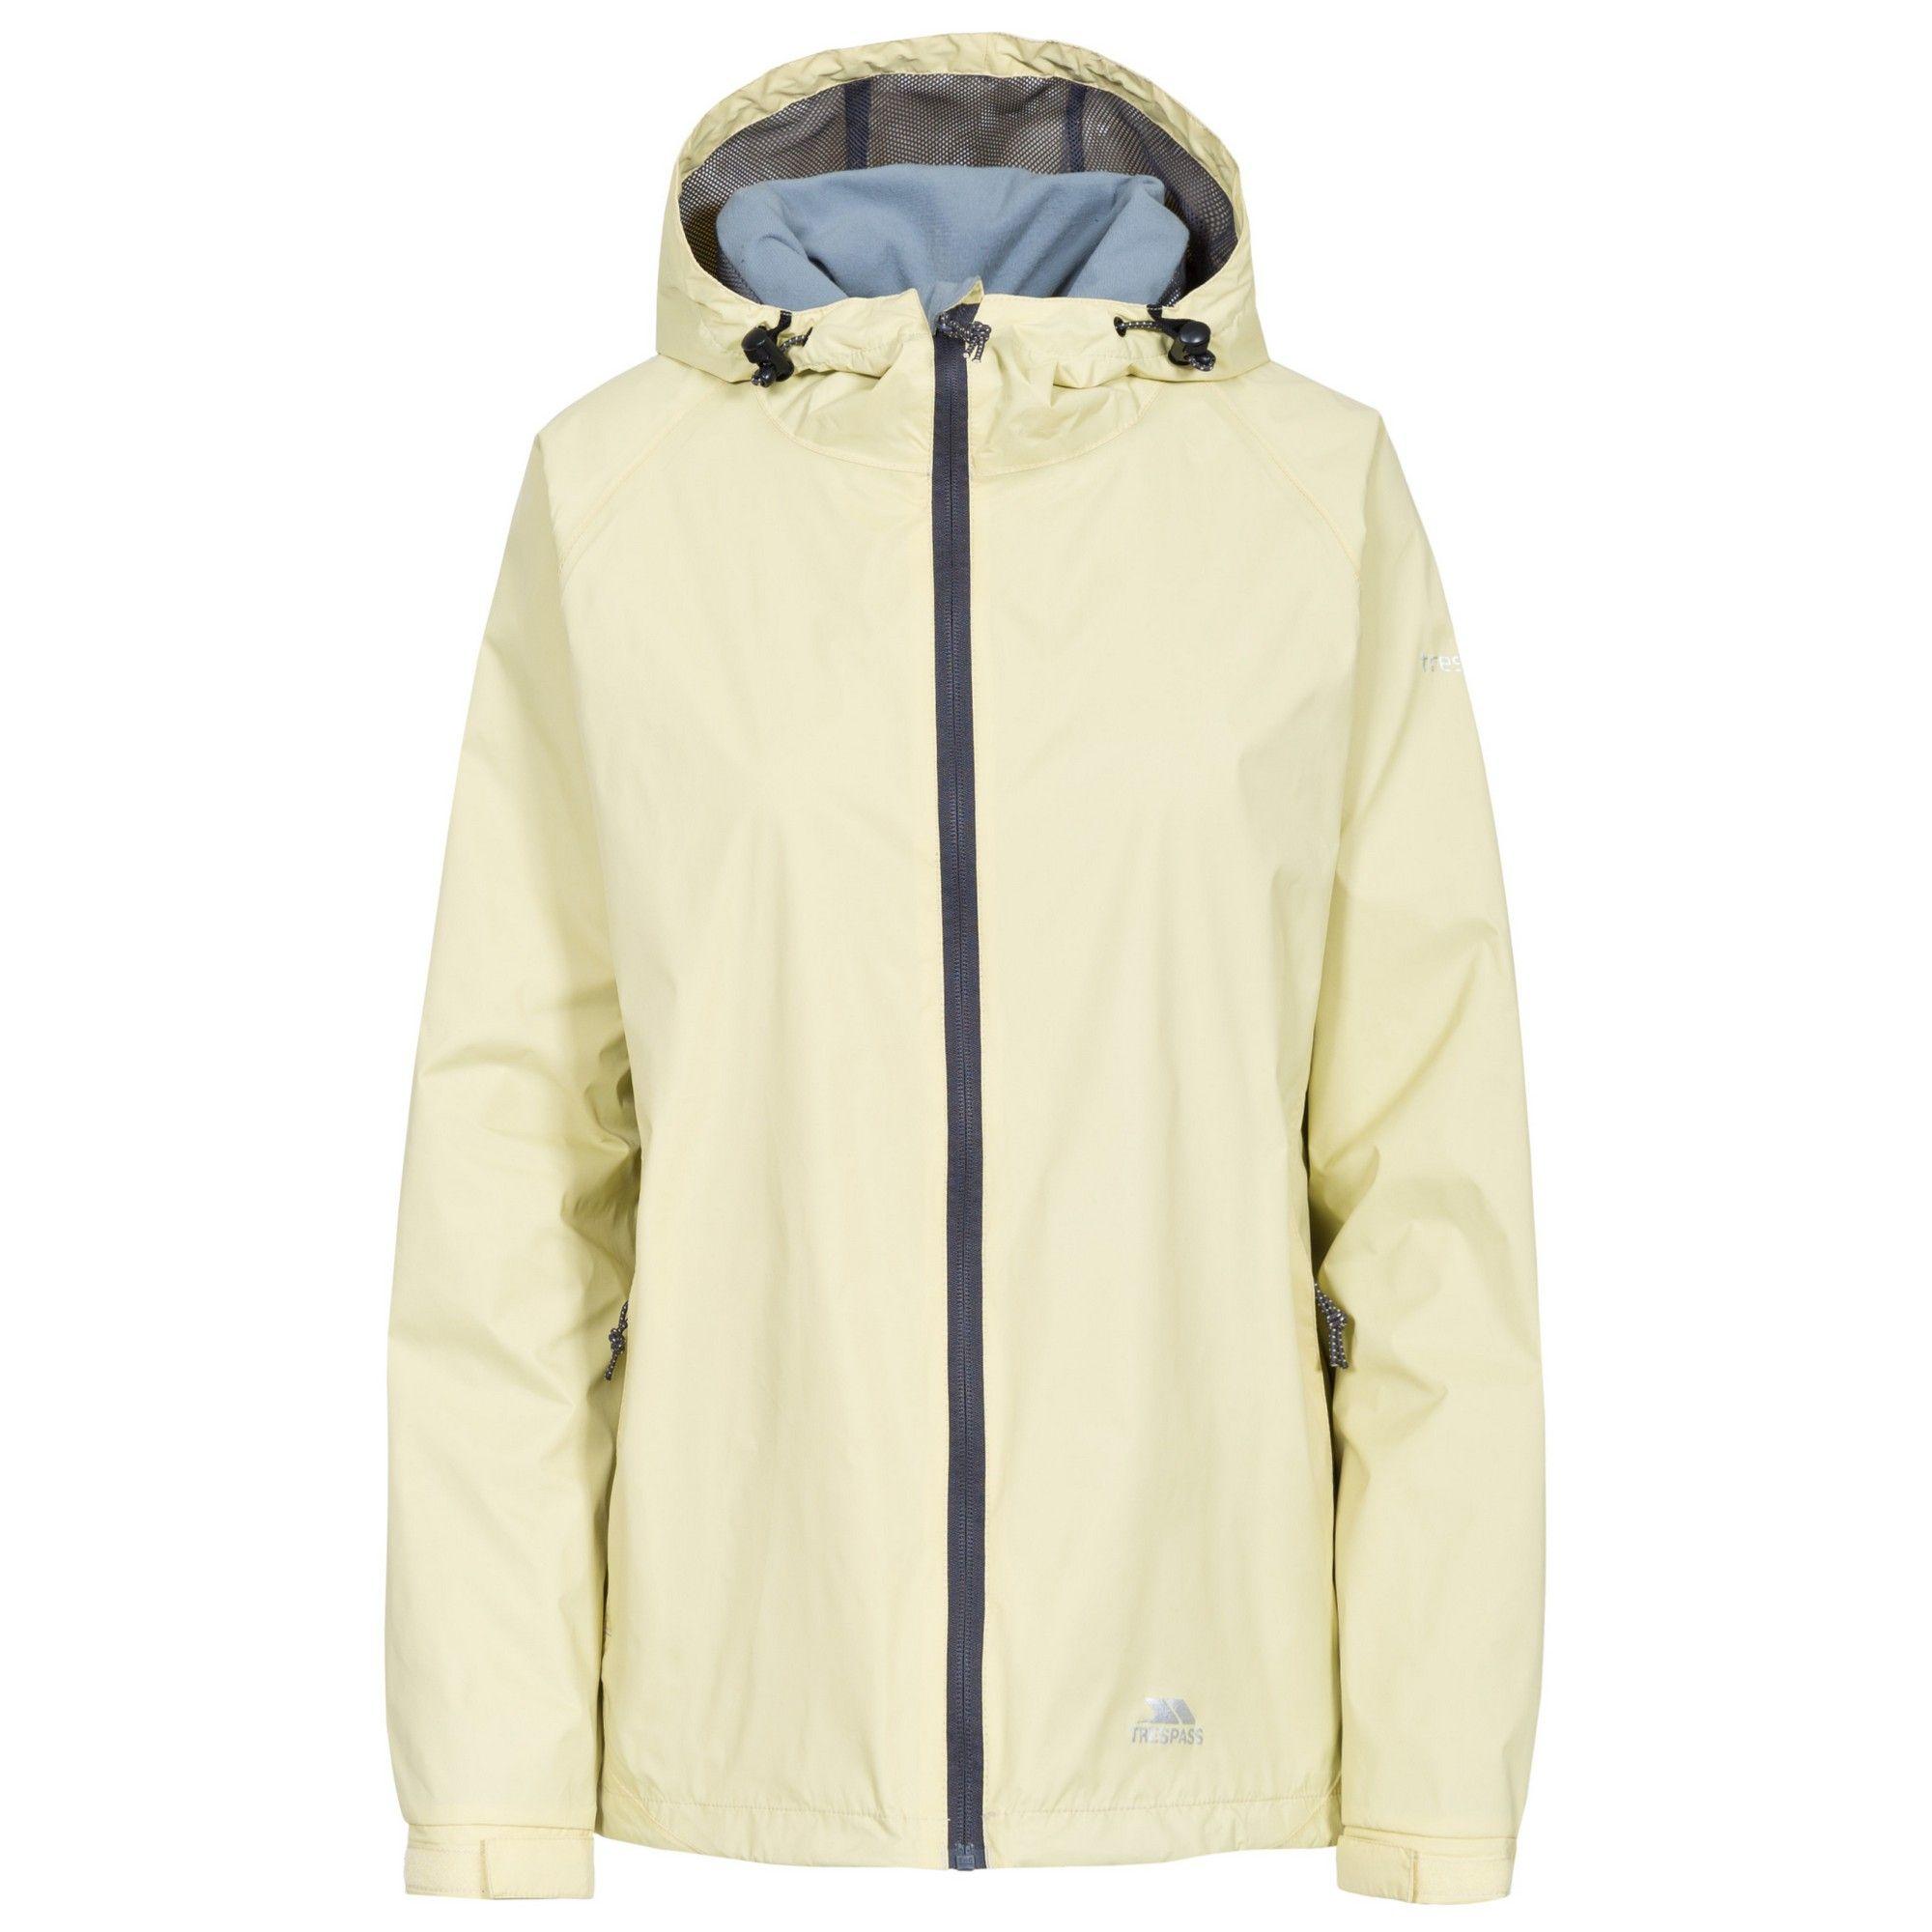 Trespass Womens/Ladies Tayah II Waterproof Shell Jacket